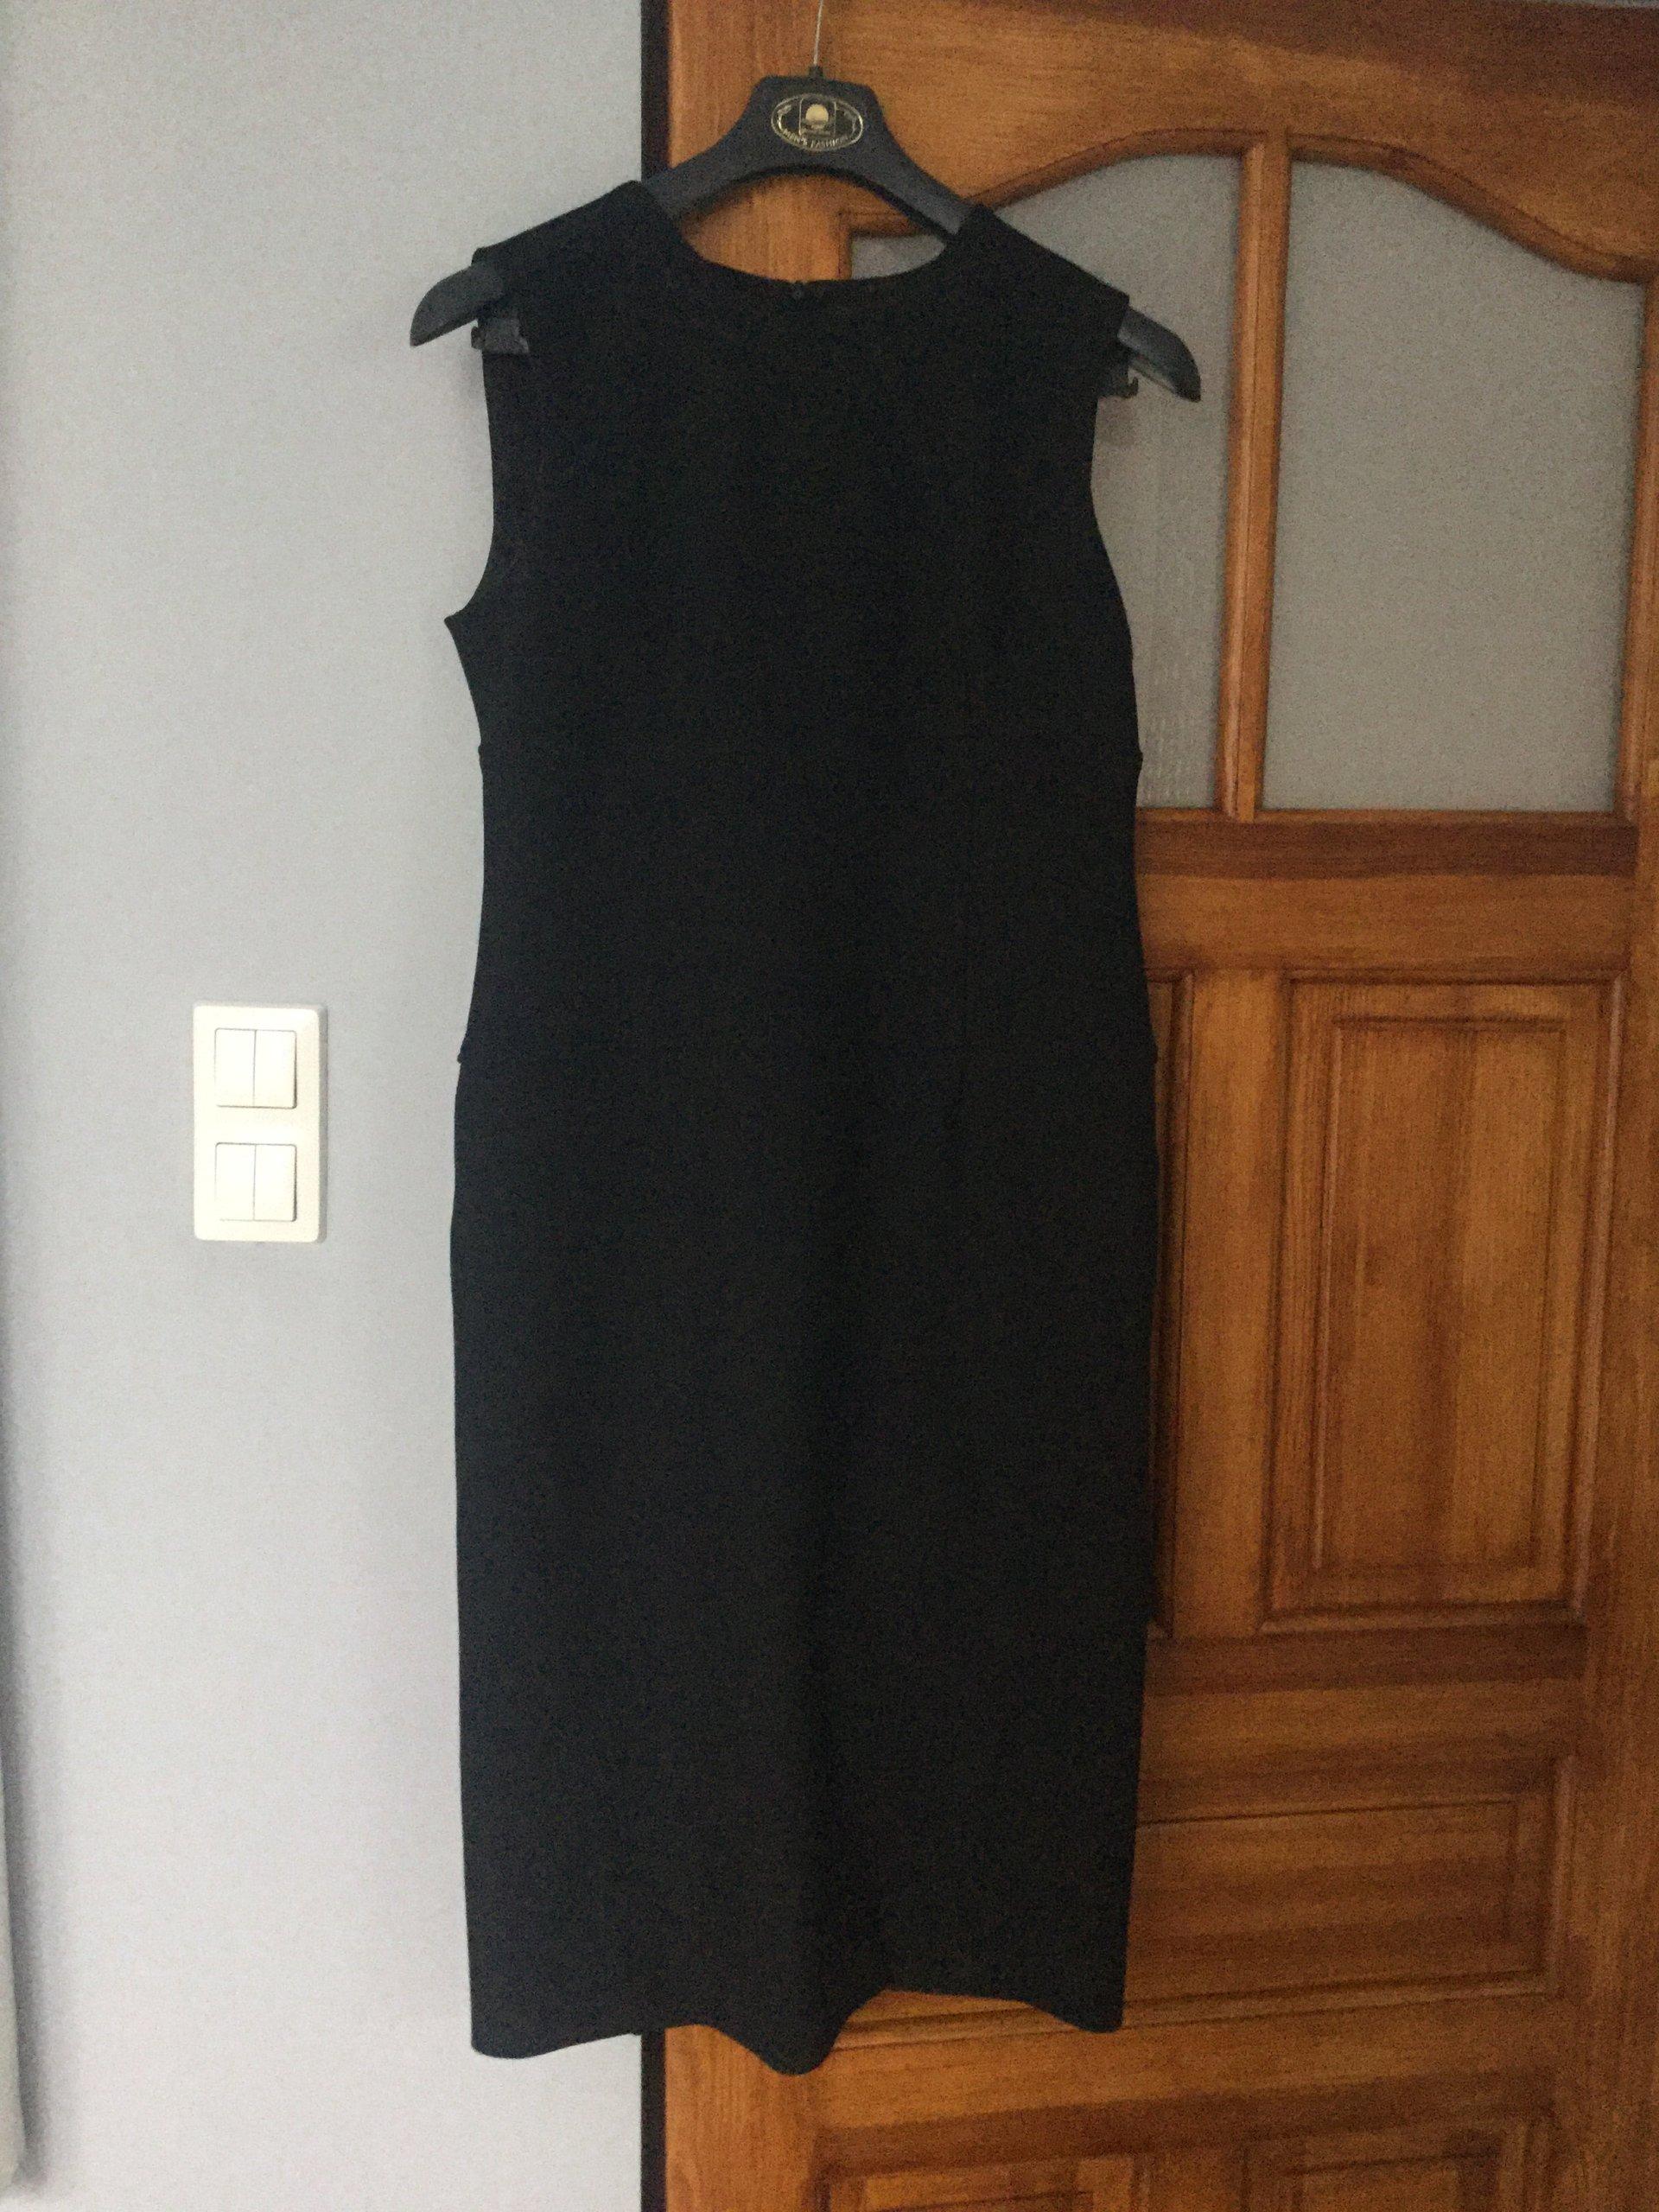 108d4d23e6 Sukienka czarna rozm 42 SIMPLE - 7181859409 - oficjalne archiwum allegro